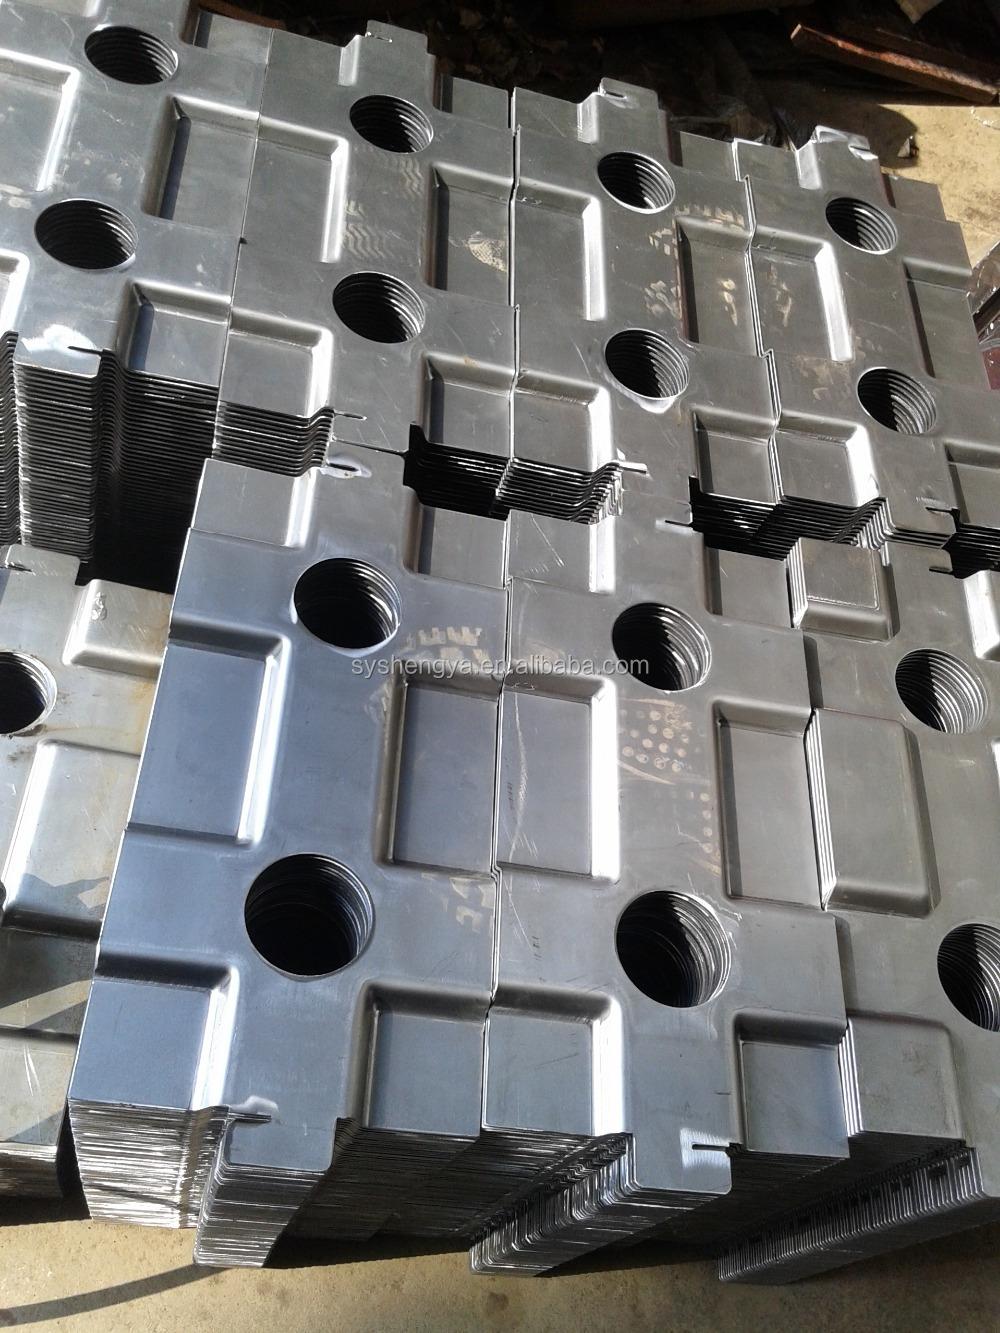 Foam generator for foam concrete clc blocks concrete molds for Foam concrete forms for sale